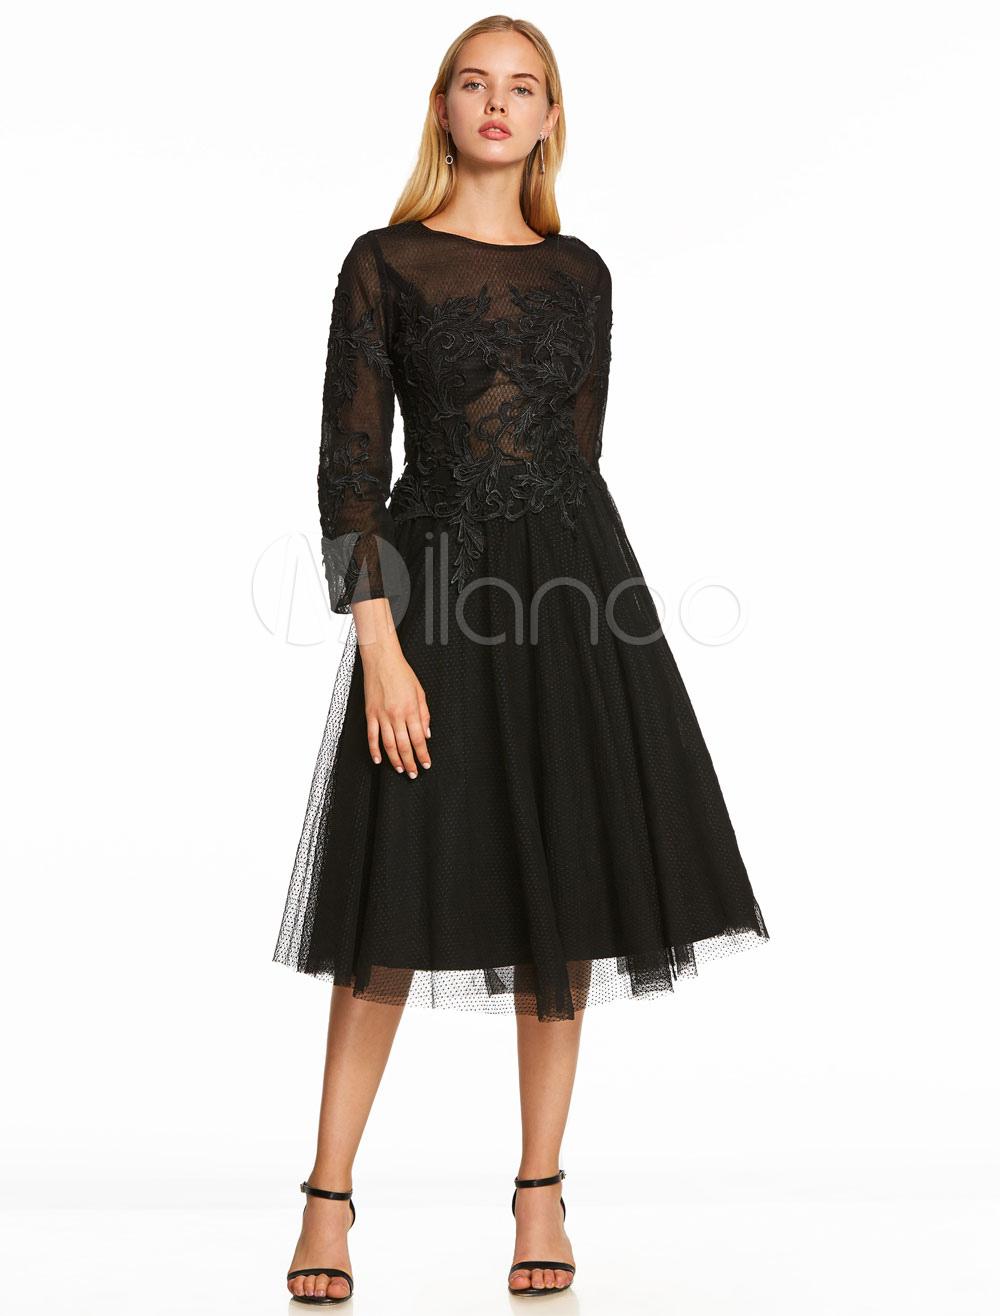 Buy Little Black Dresses Lace Long Sleeve Black Cocktail Dress Lace Applique Illusion Short Party Dress for $87.99 in Milanoo store